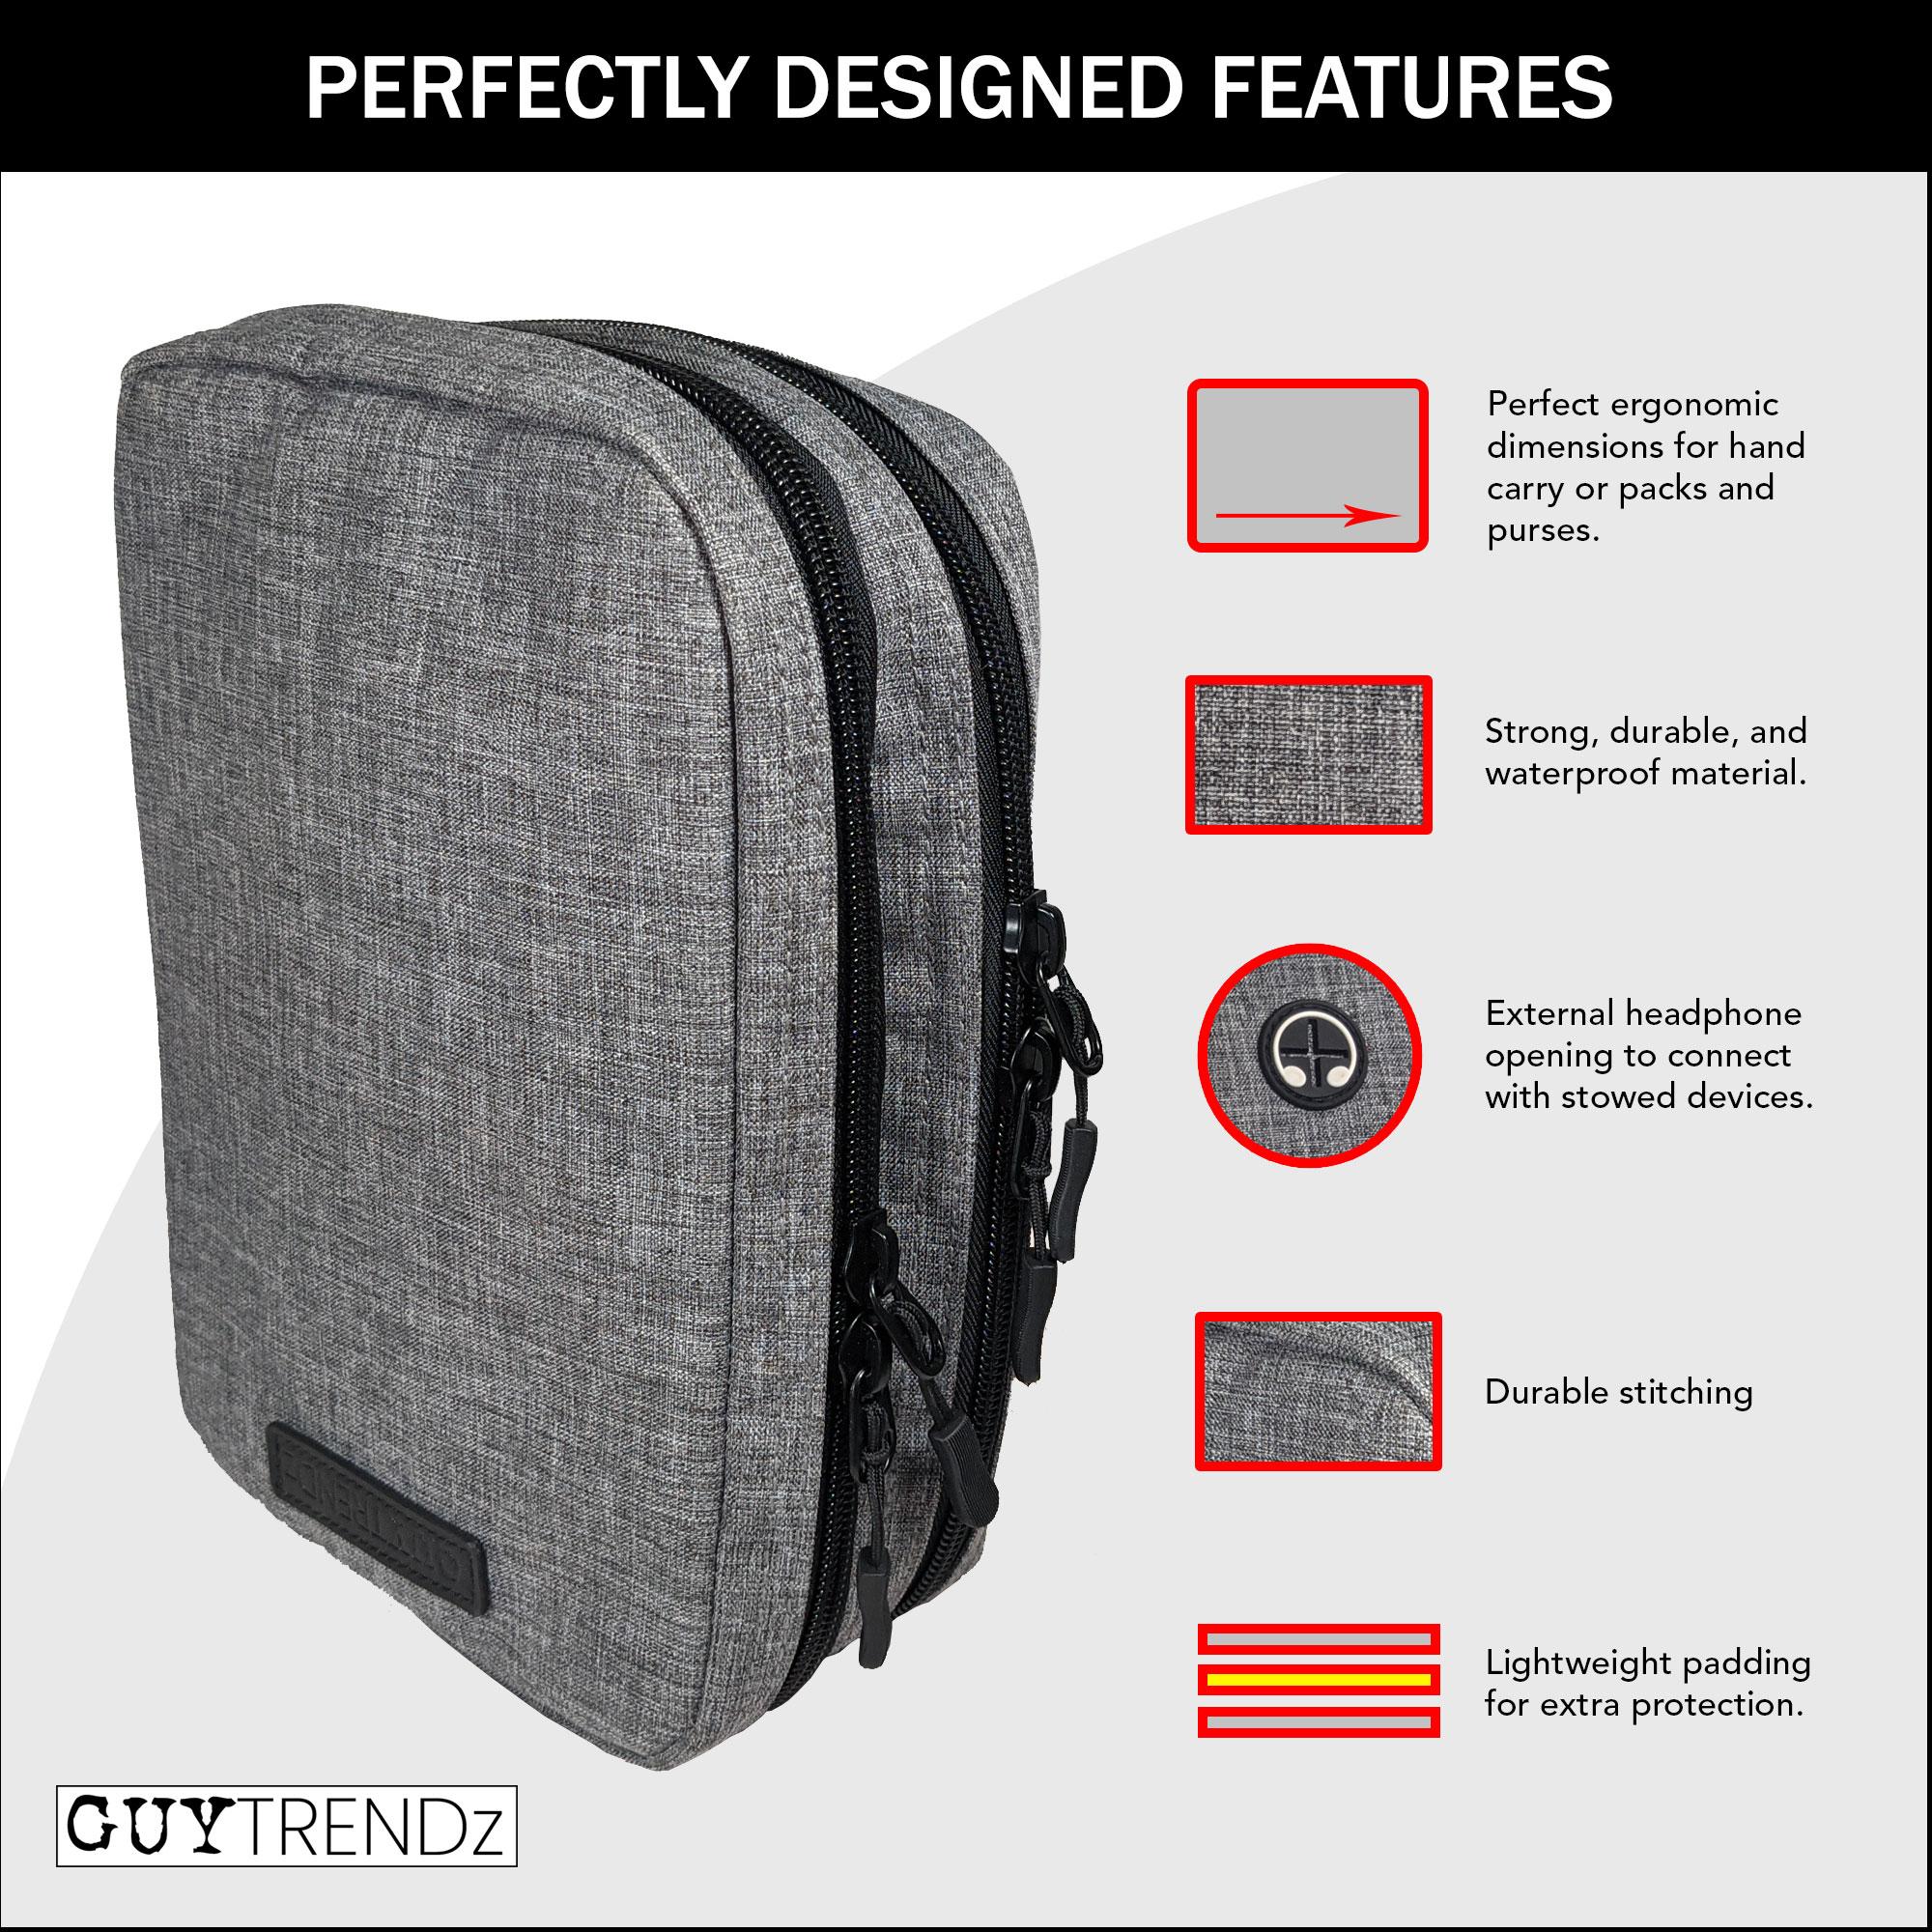 21 09 17 16 40 26 original b09fygb86s electronics bag exterior features